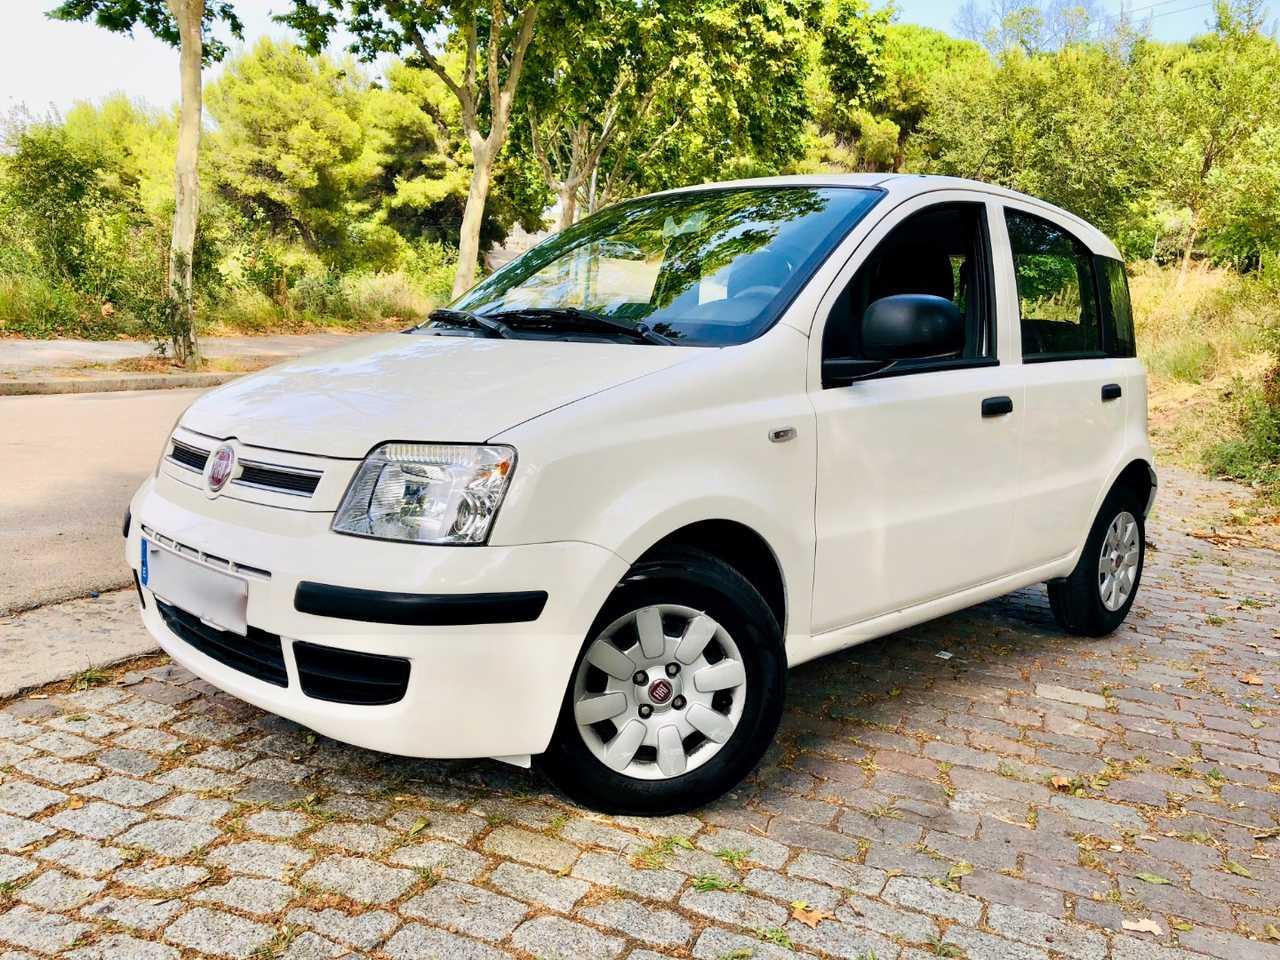 Fiat Panda 1.2 Dynamic. Unico dueño. Impecable.   - Foto 1